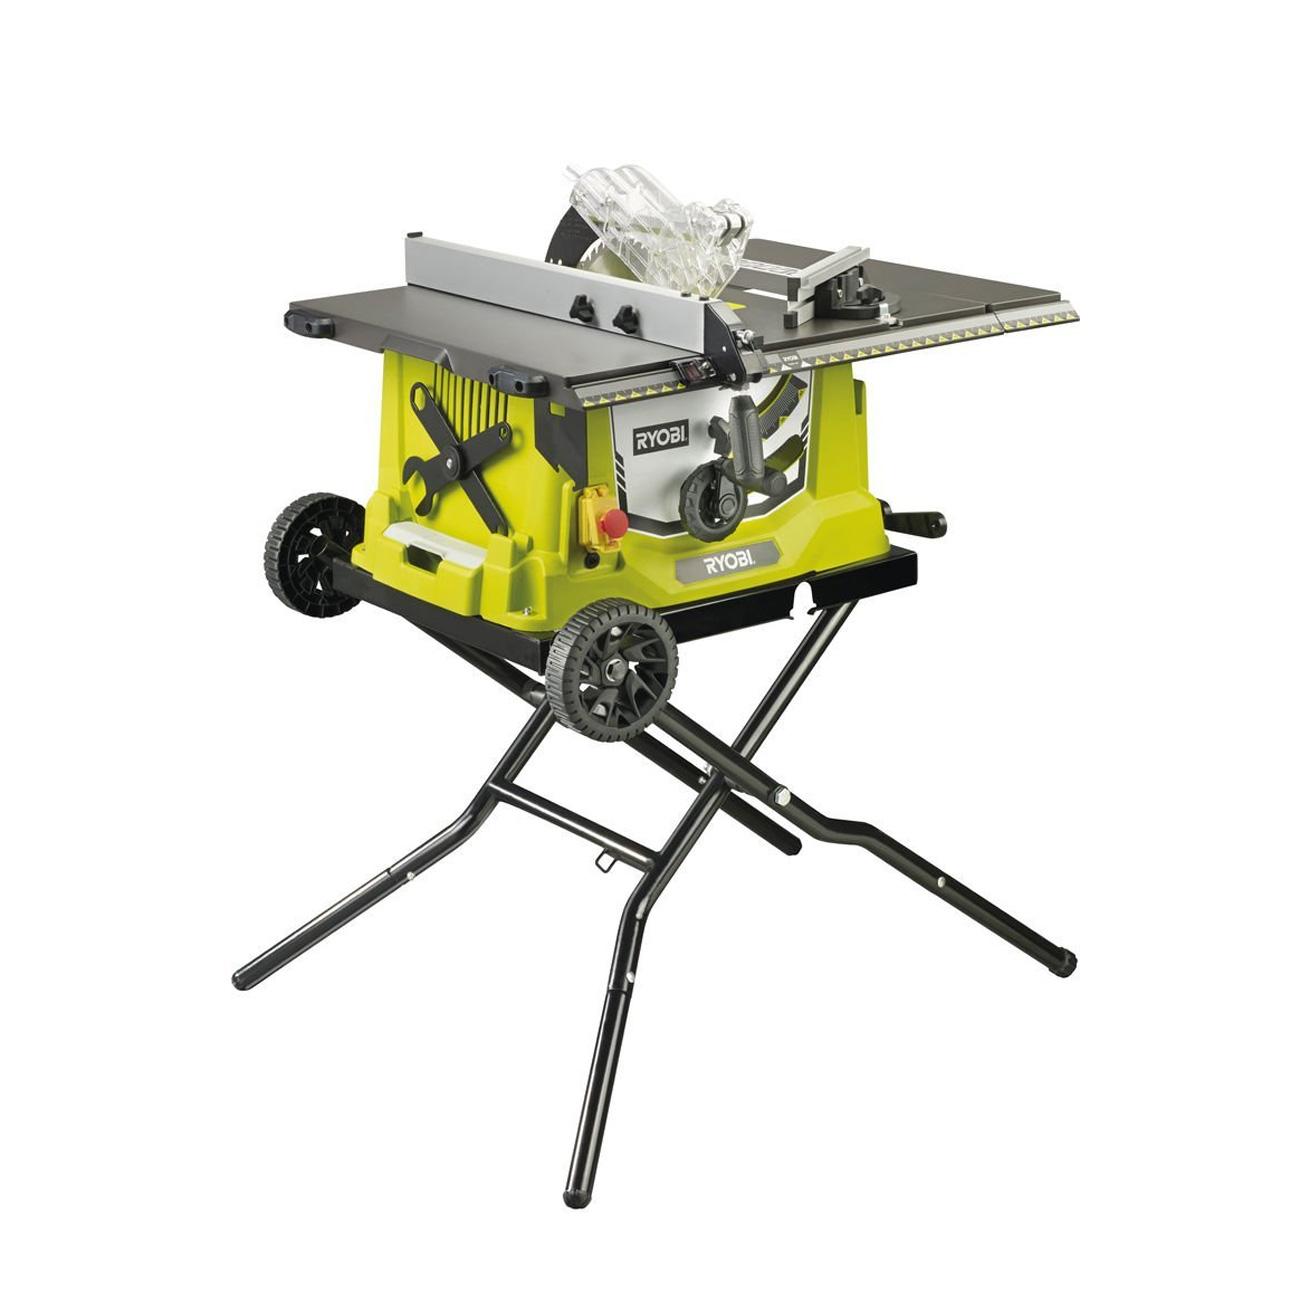 Ryobi RTS1800EF-G Bench saw - Refurbished 1